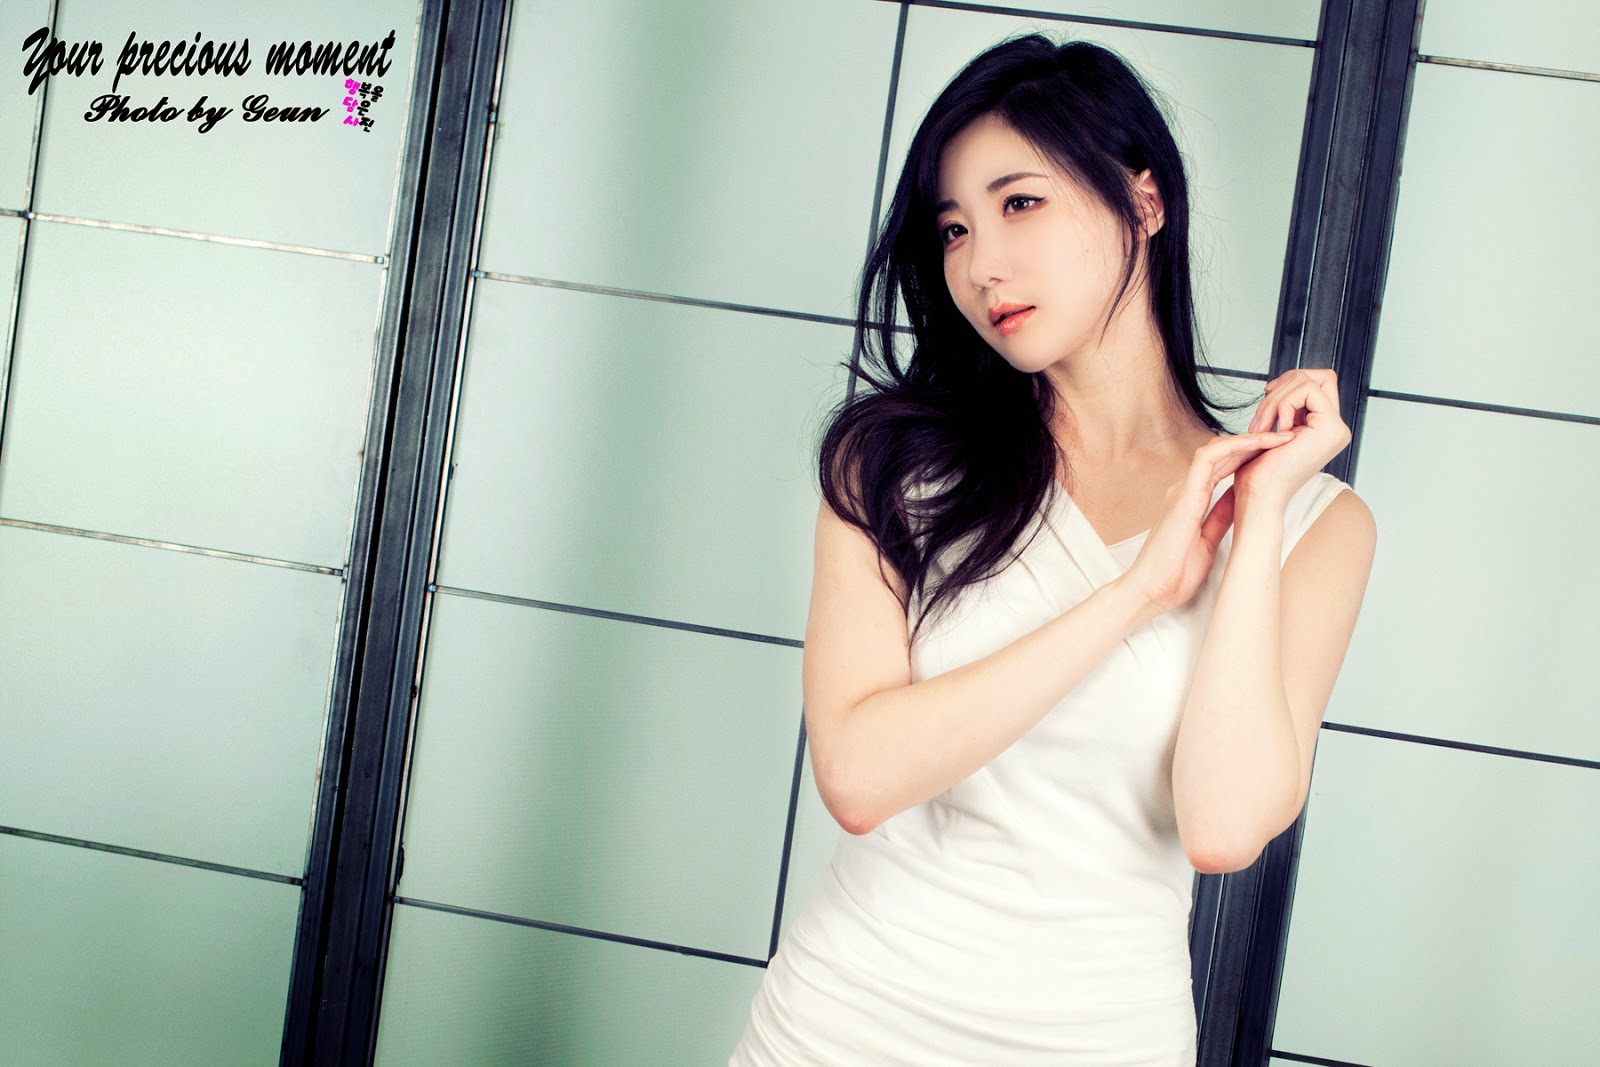 1 Yeon Da Bin- Three new studio sets - very cute asian girl - girlcute4u.blogspot.com